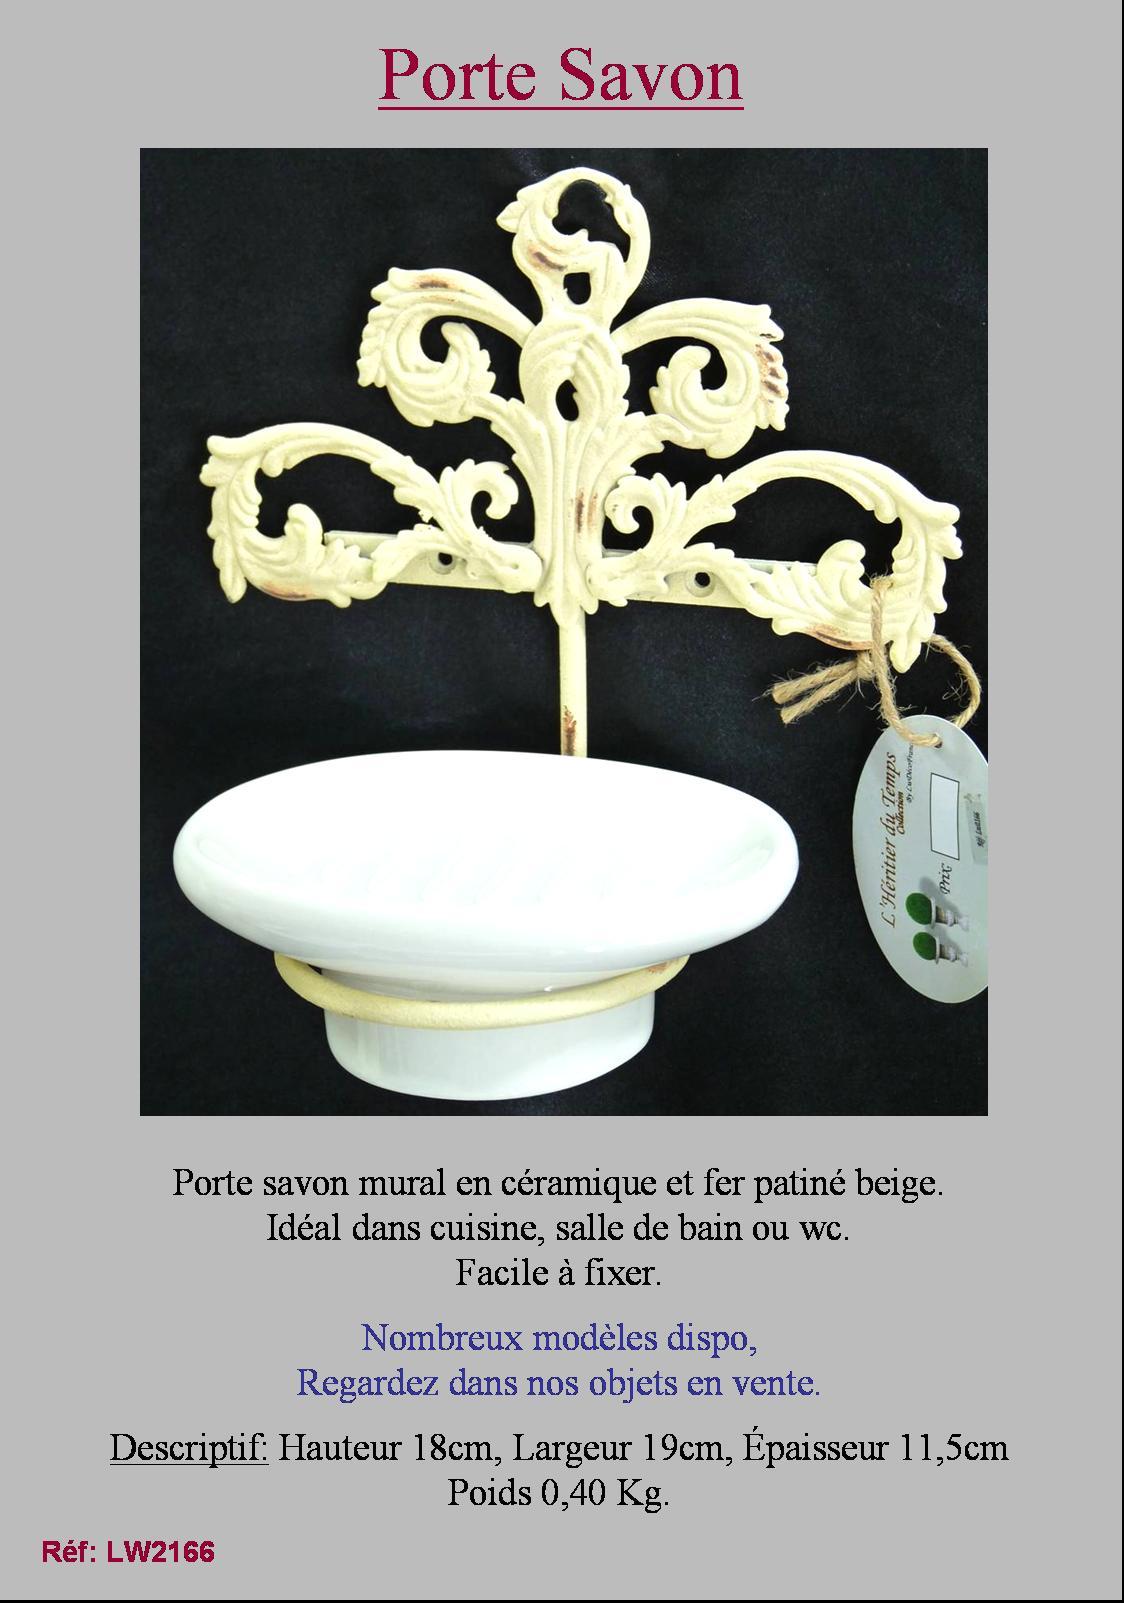 meuble accessoire salle de bain cuisine porte savon eponge. Black Bedroom Furniture Sets. Home Design Ideas